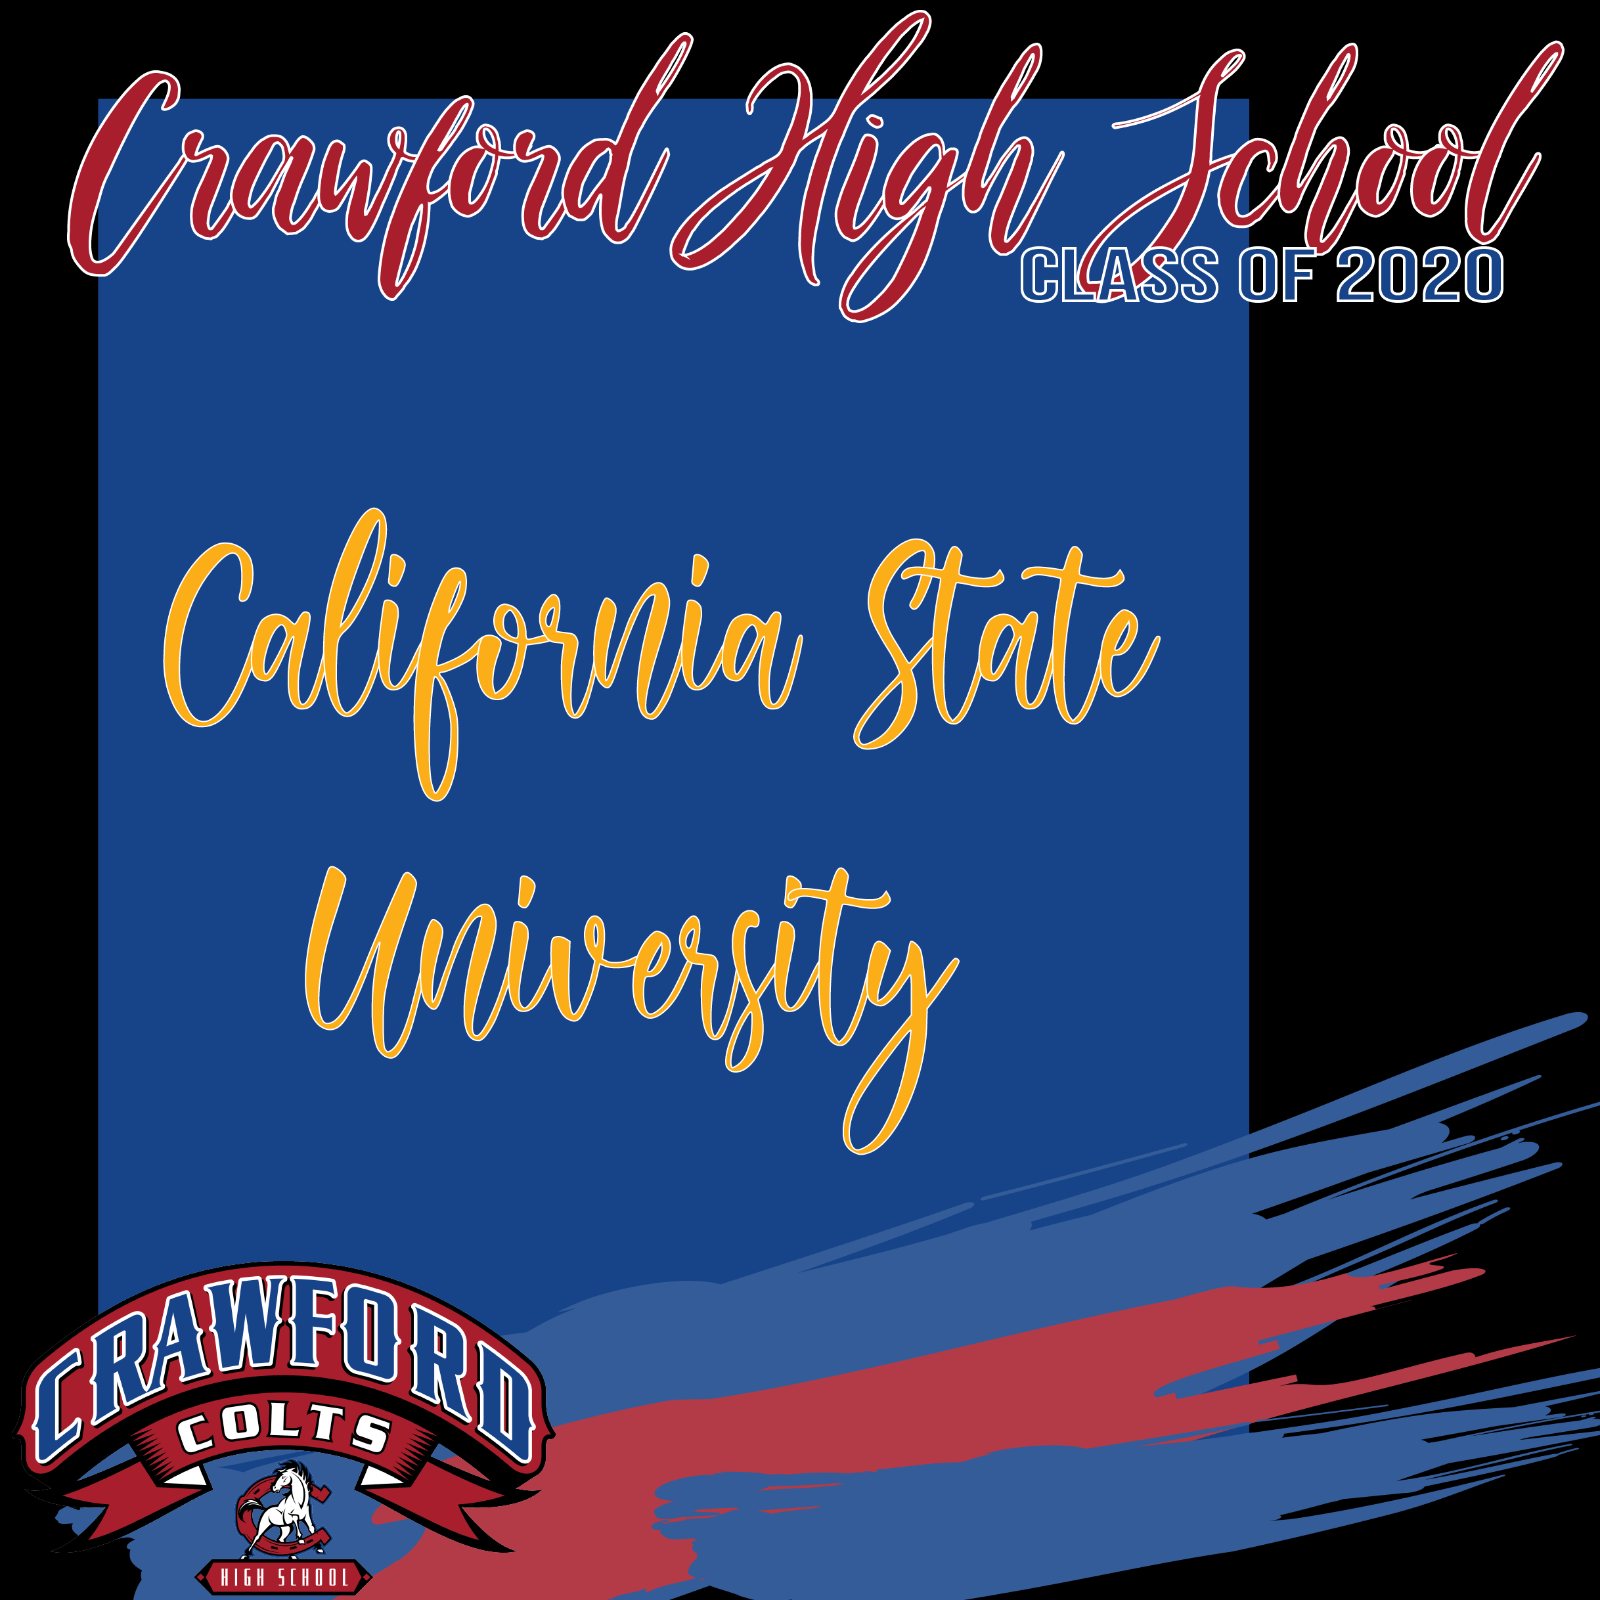 Celebrating Class of 2020-California State University